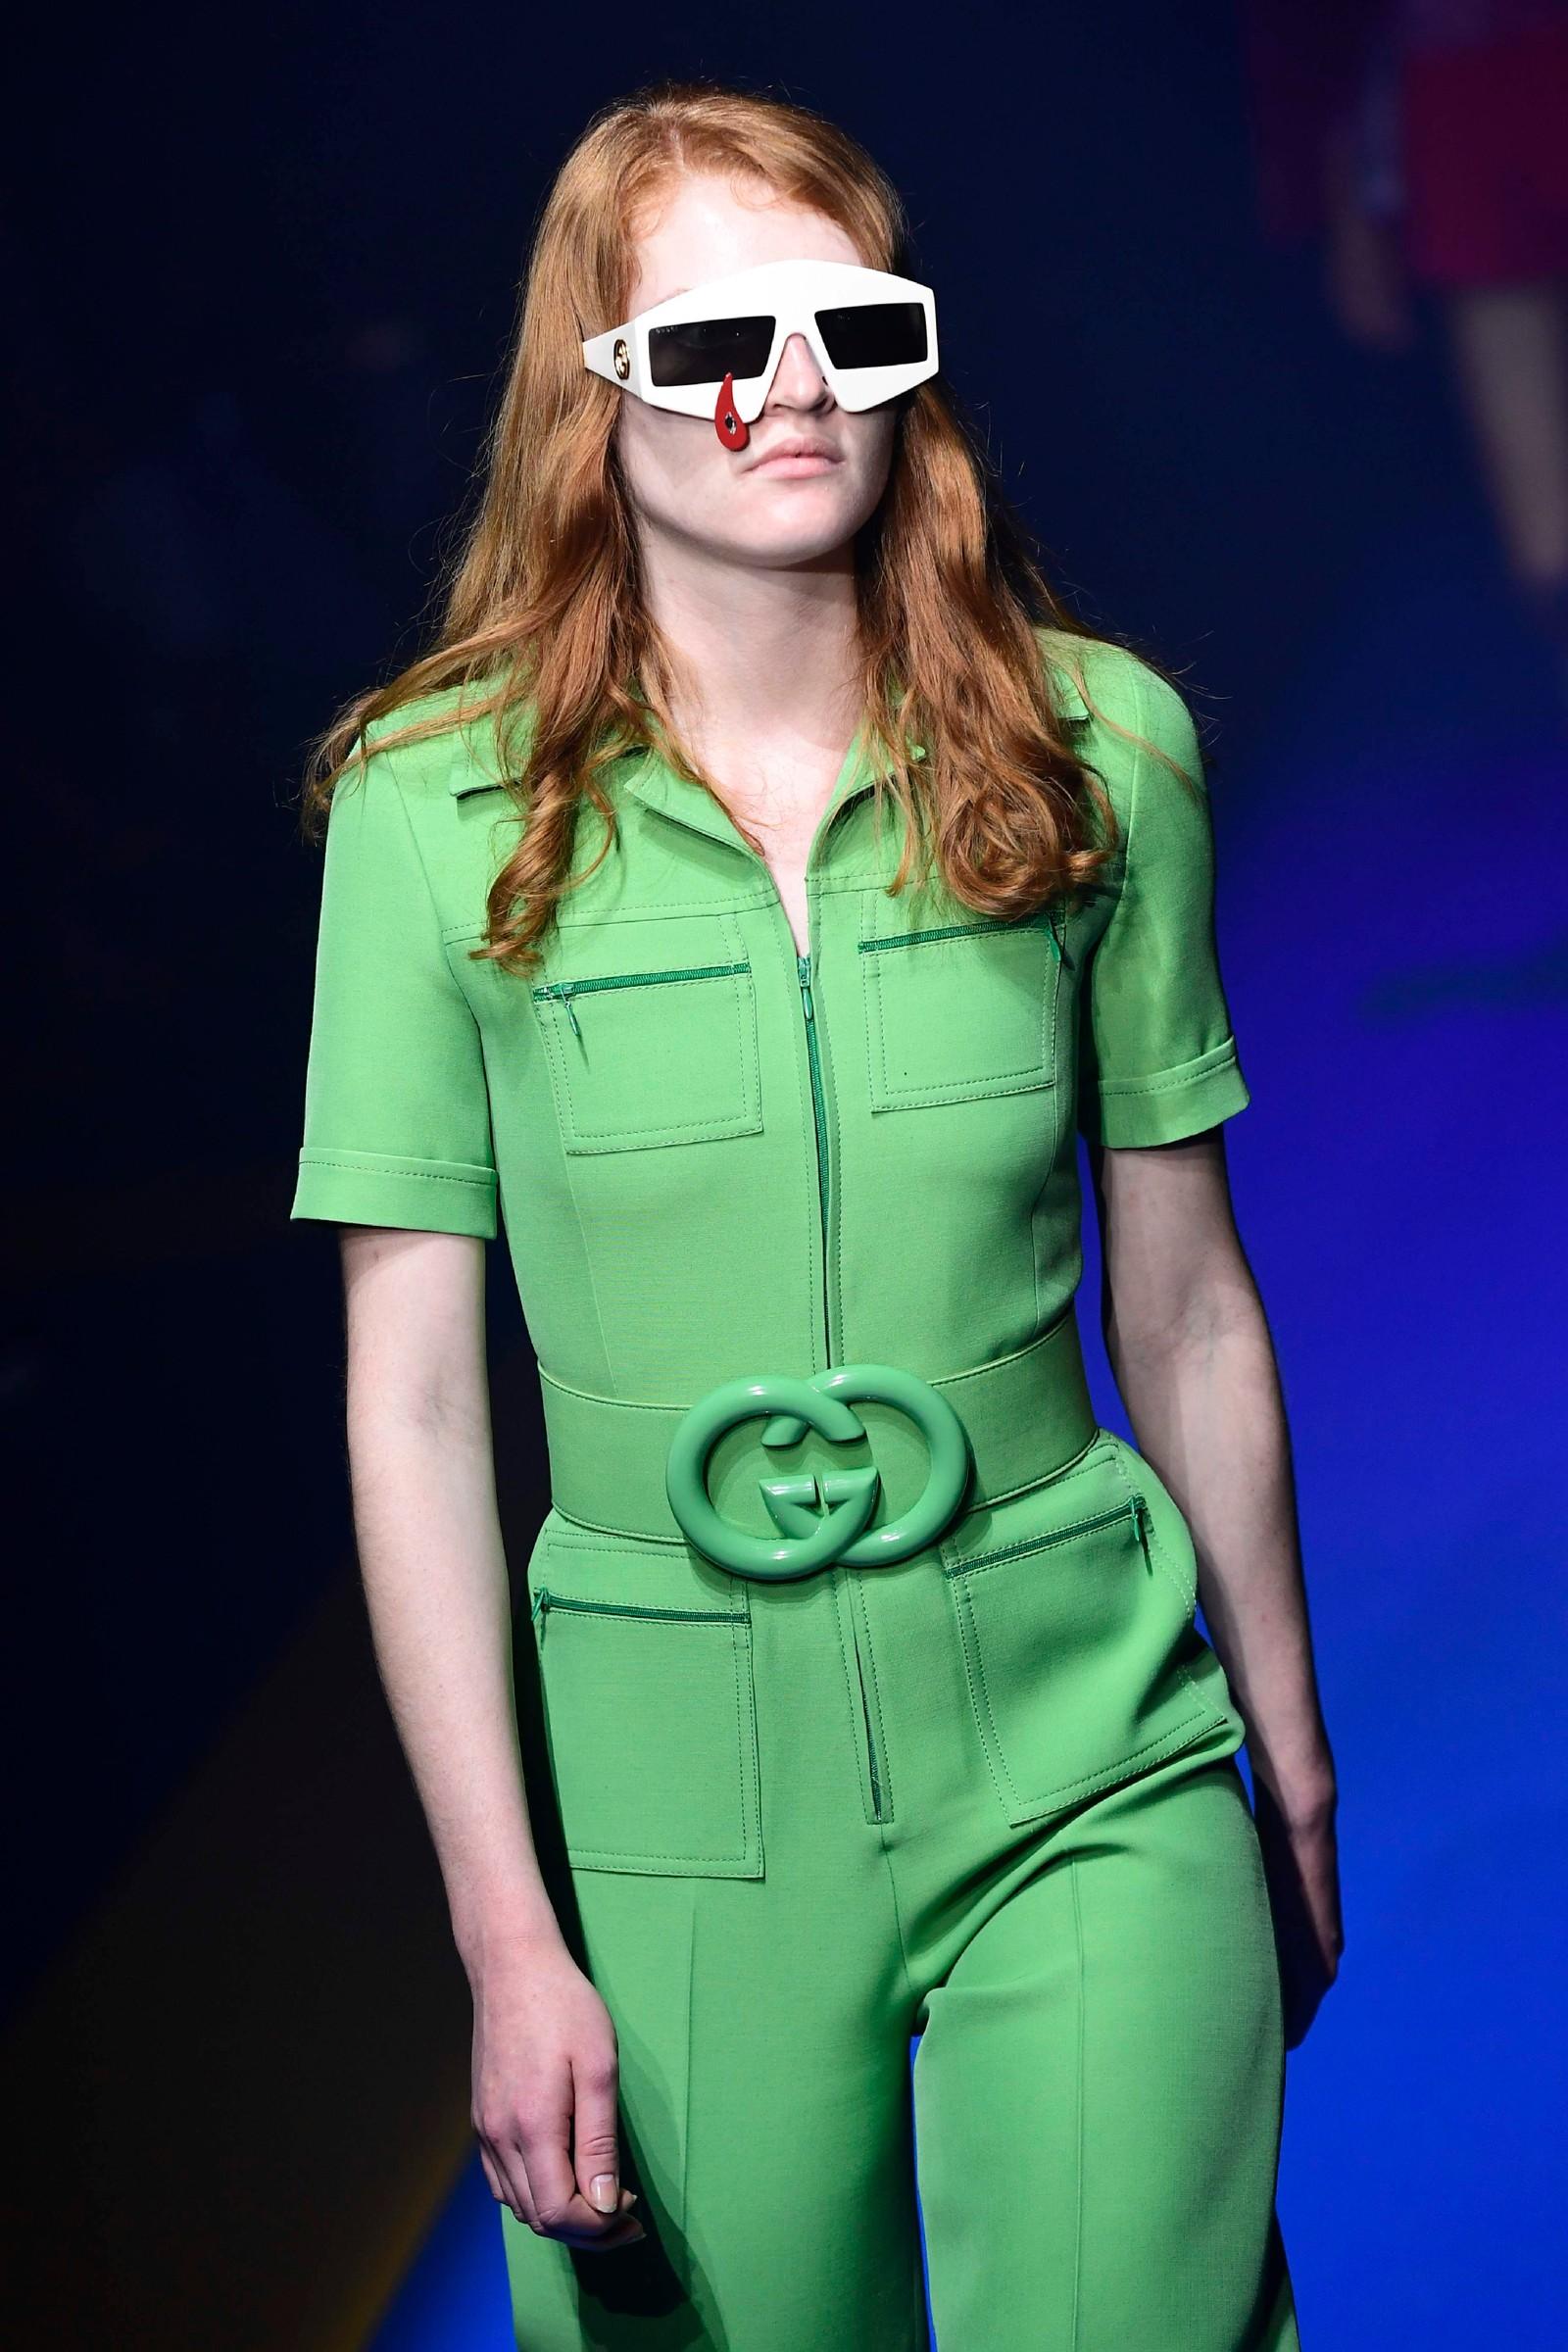 Gucci: Grøn buksedress.